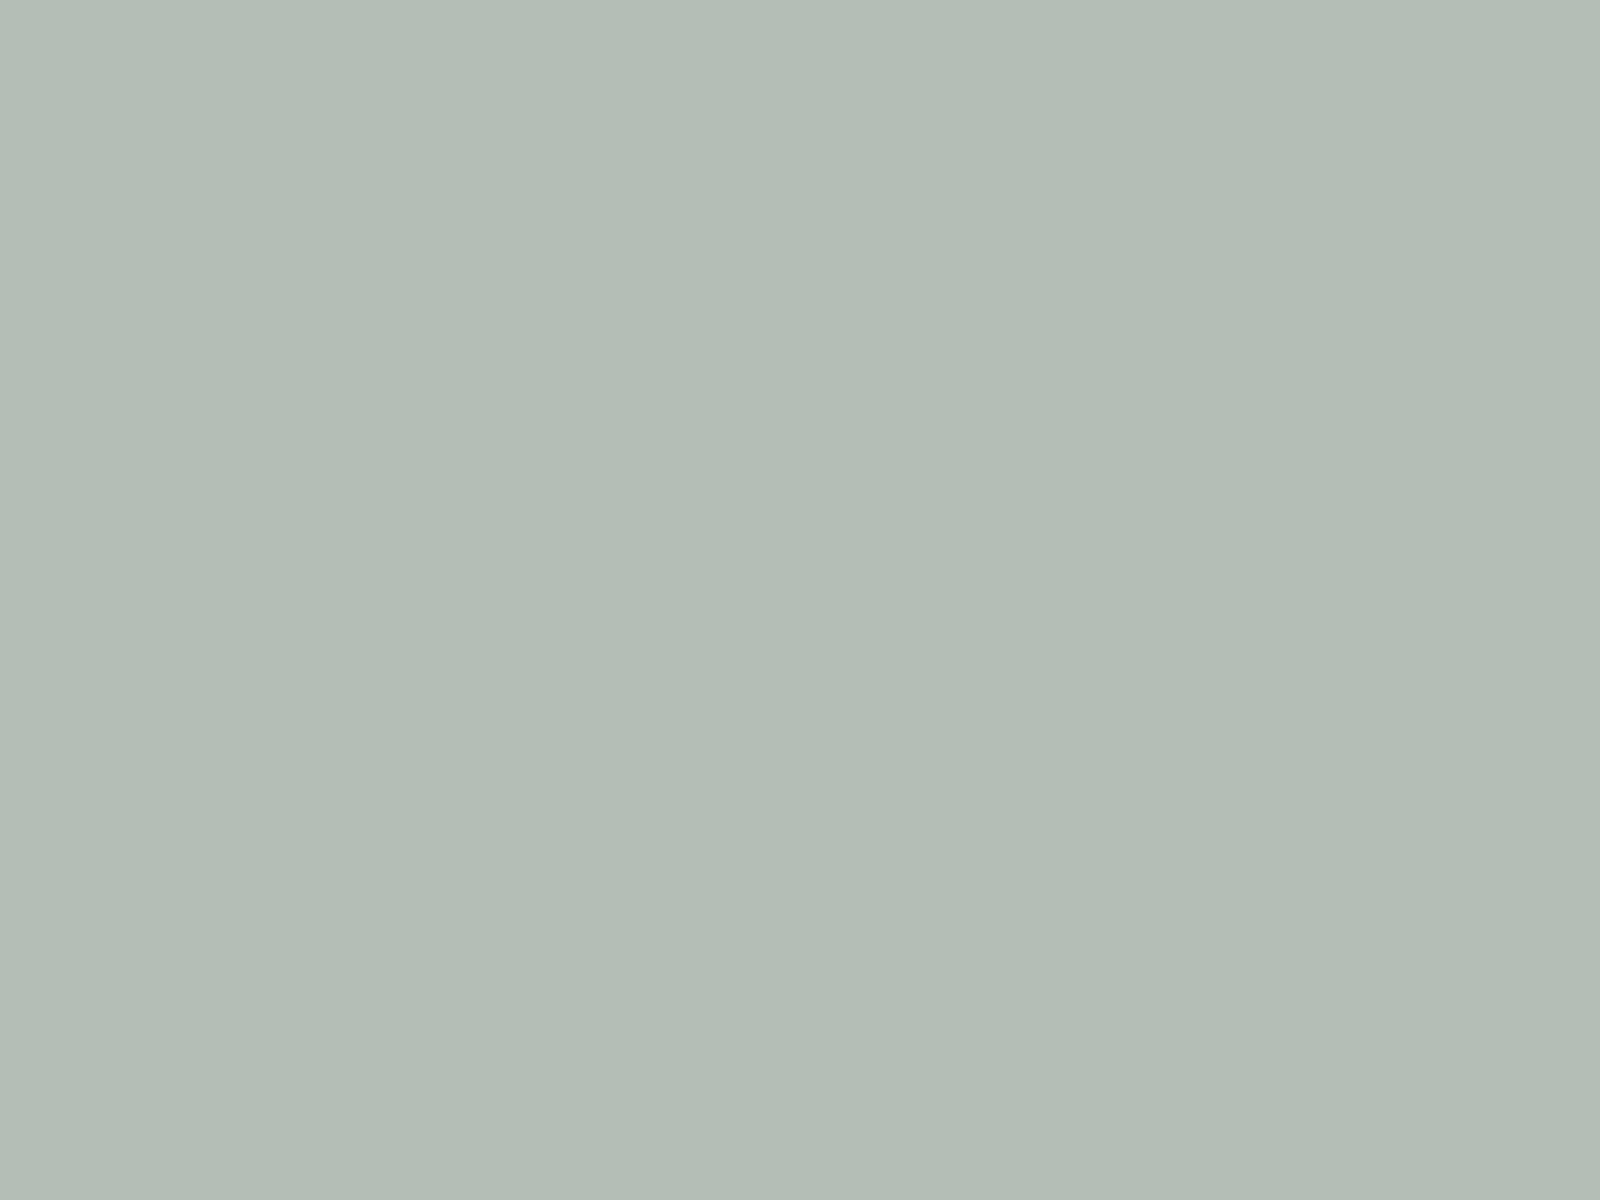 1600x1200 Ash Grey Solid Color Background